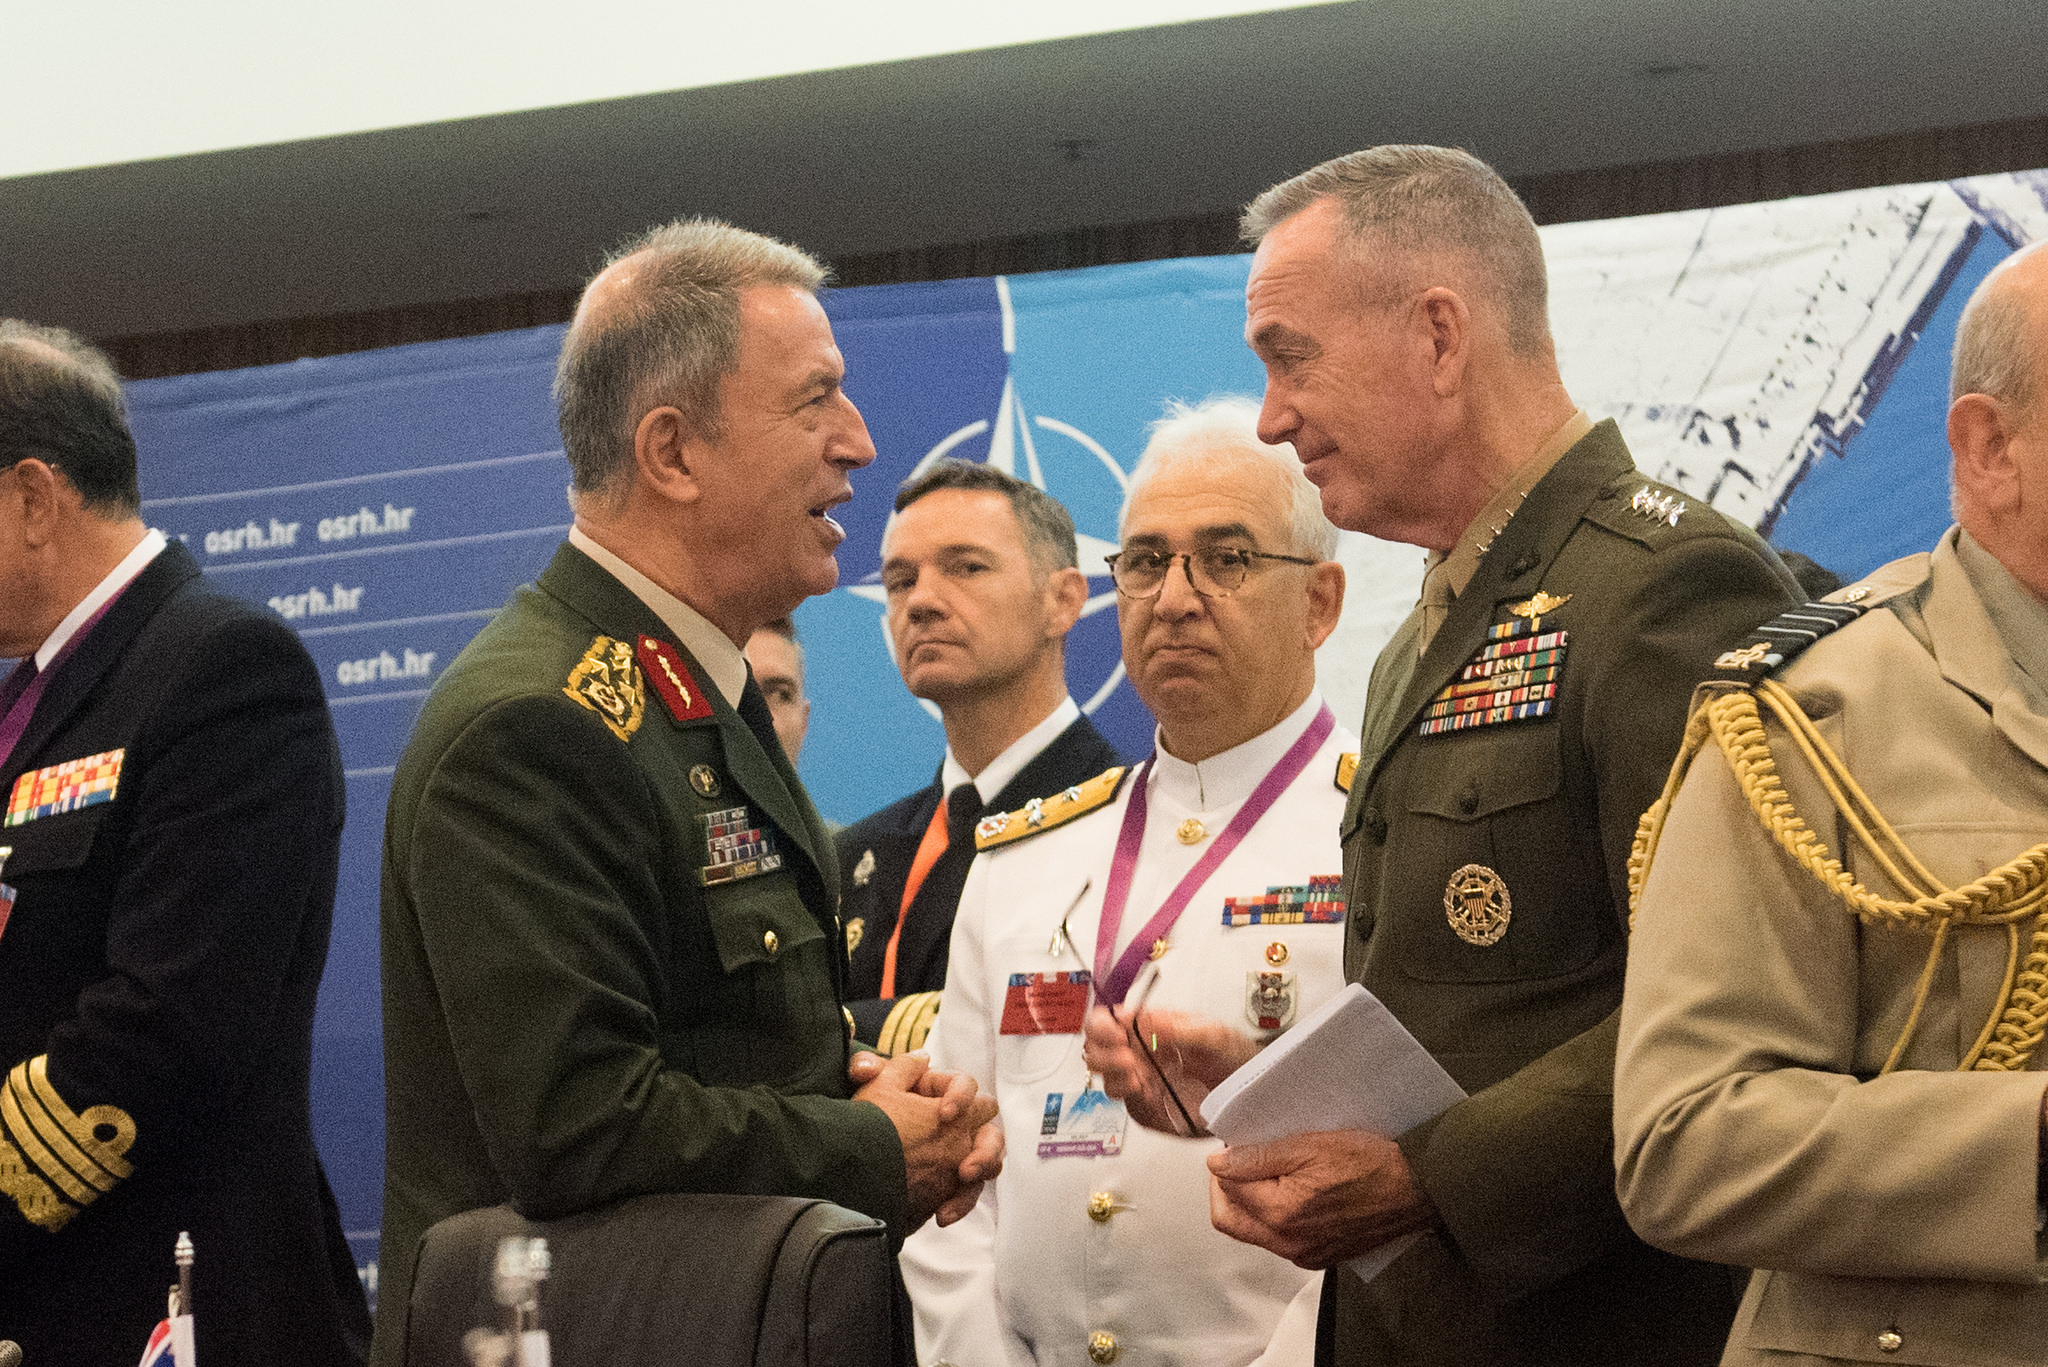 https://media.defense.gov/2016/Sep/18/2001636032/-1/-1/0/160918-D-VO565-057.JPG